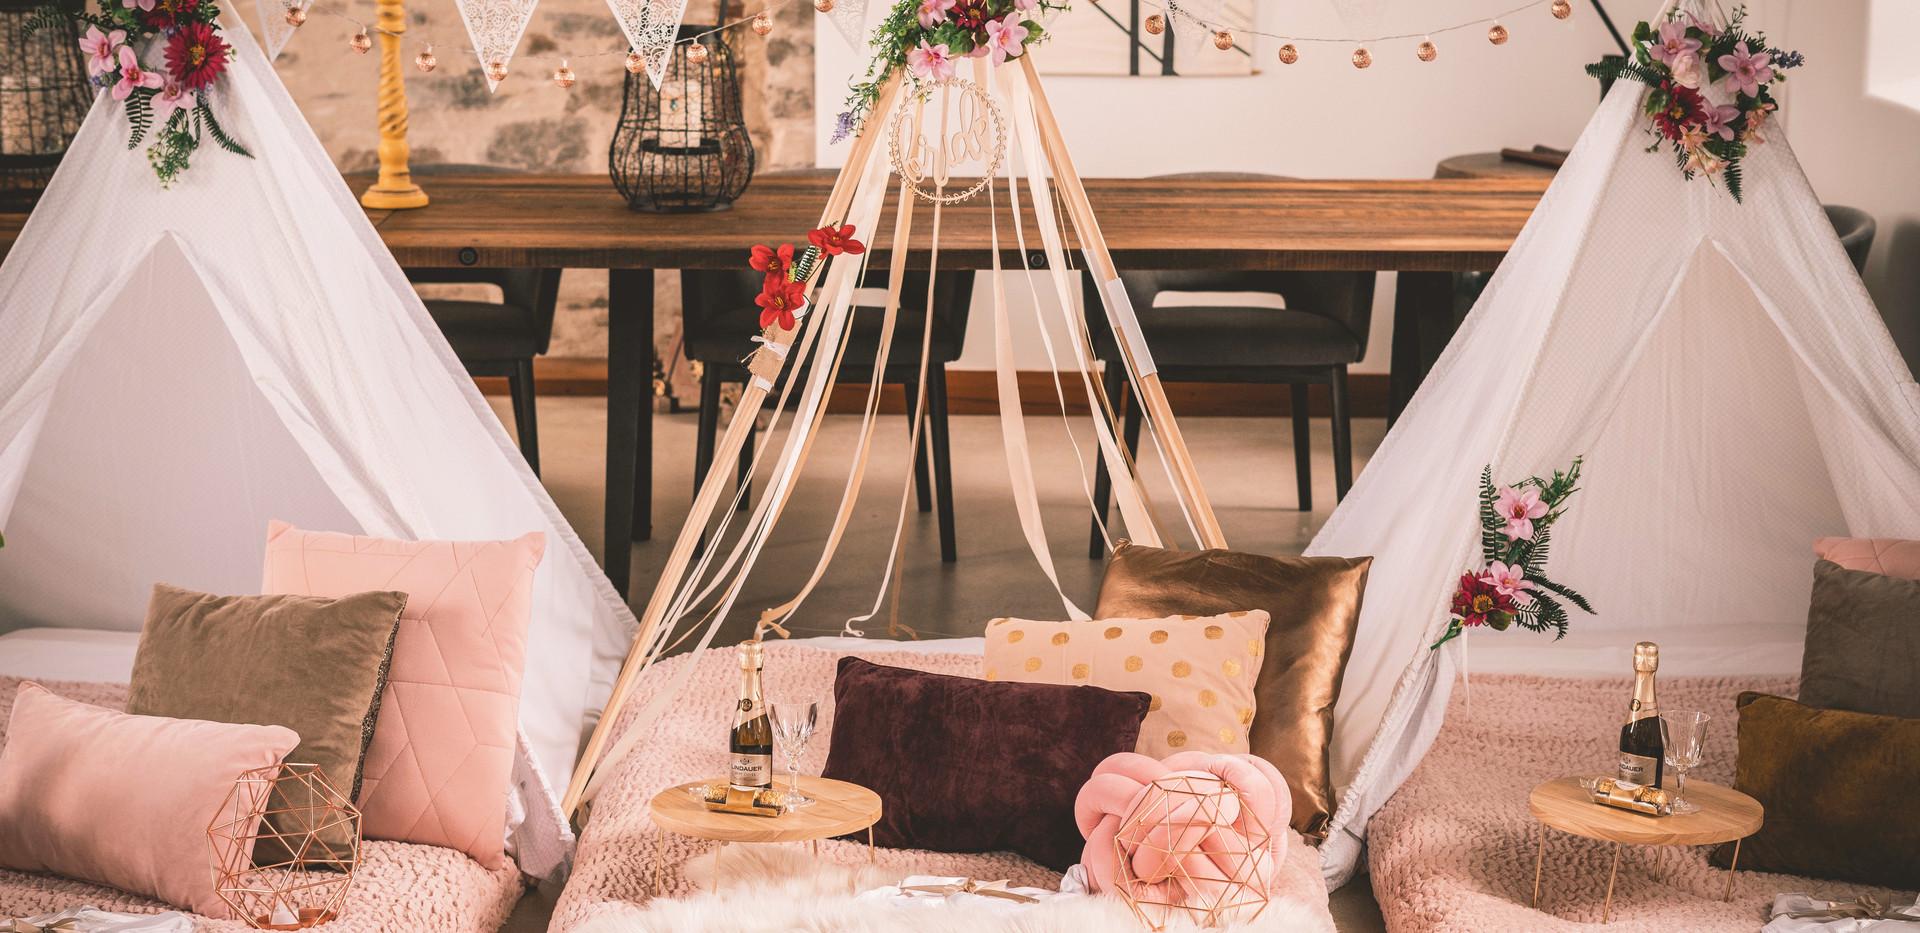 Bridal Glamping Sleepover